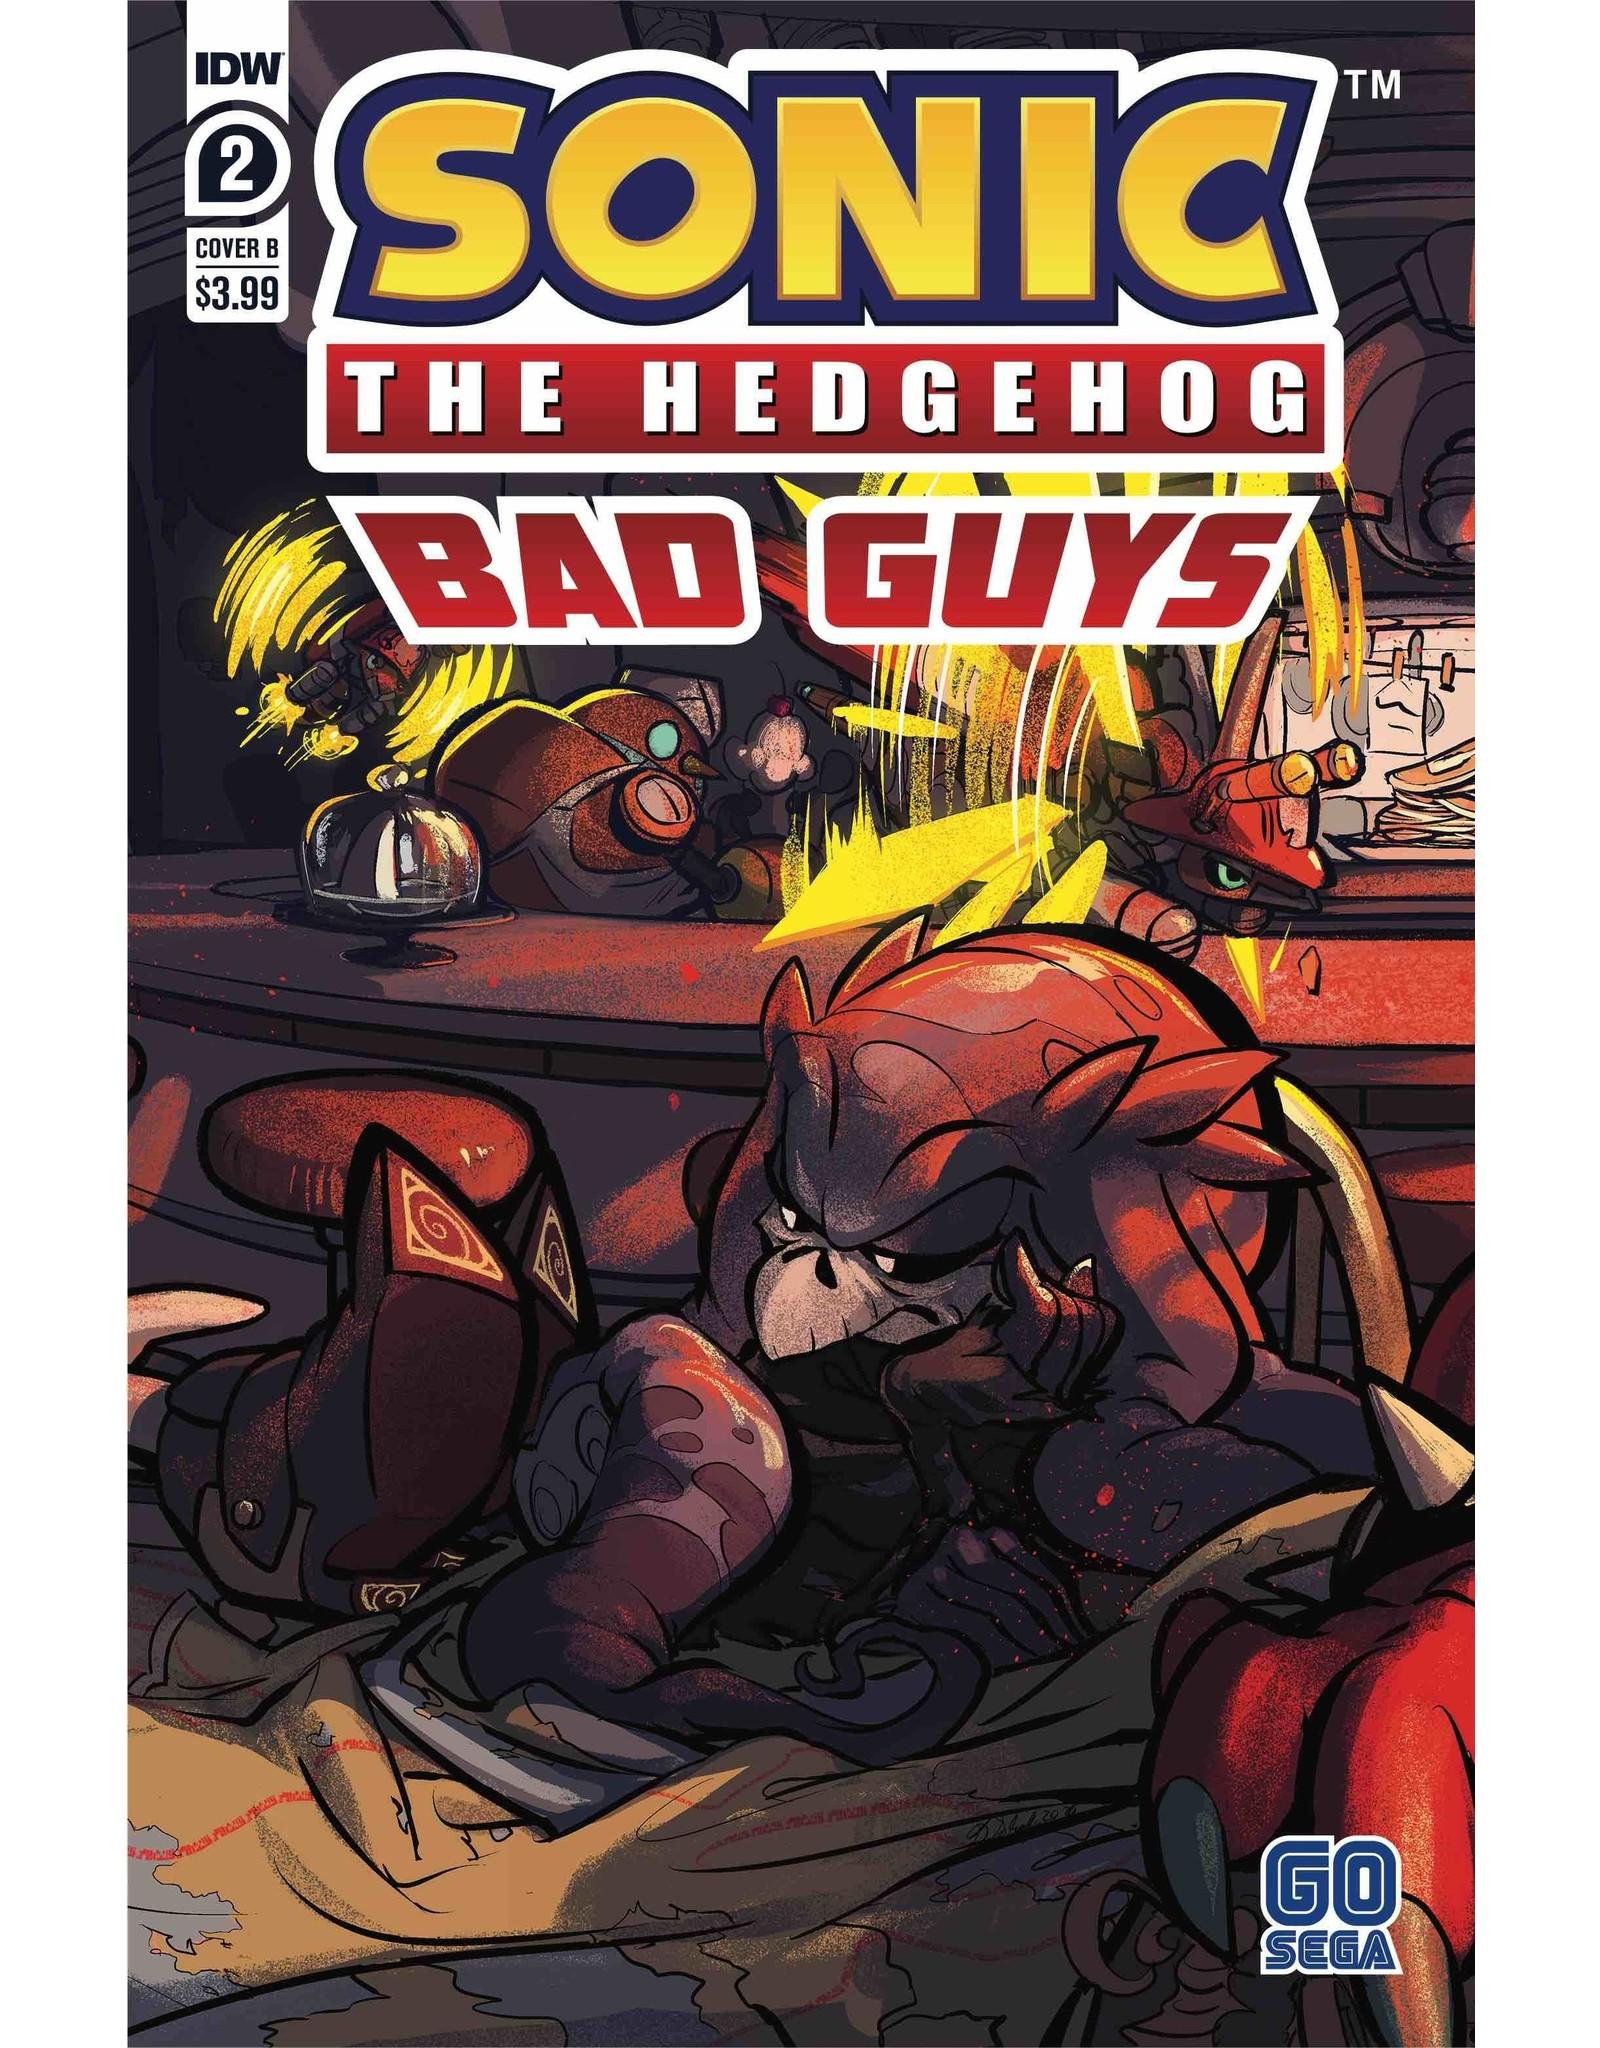 IDW PUBLISHING SONIC THE HEDGEHOG BAD GUYS #2 (OF 4) CVR B SKELLY